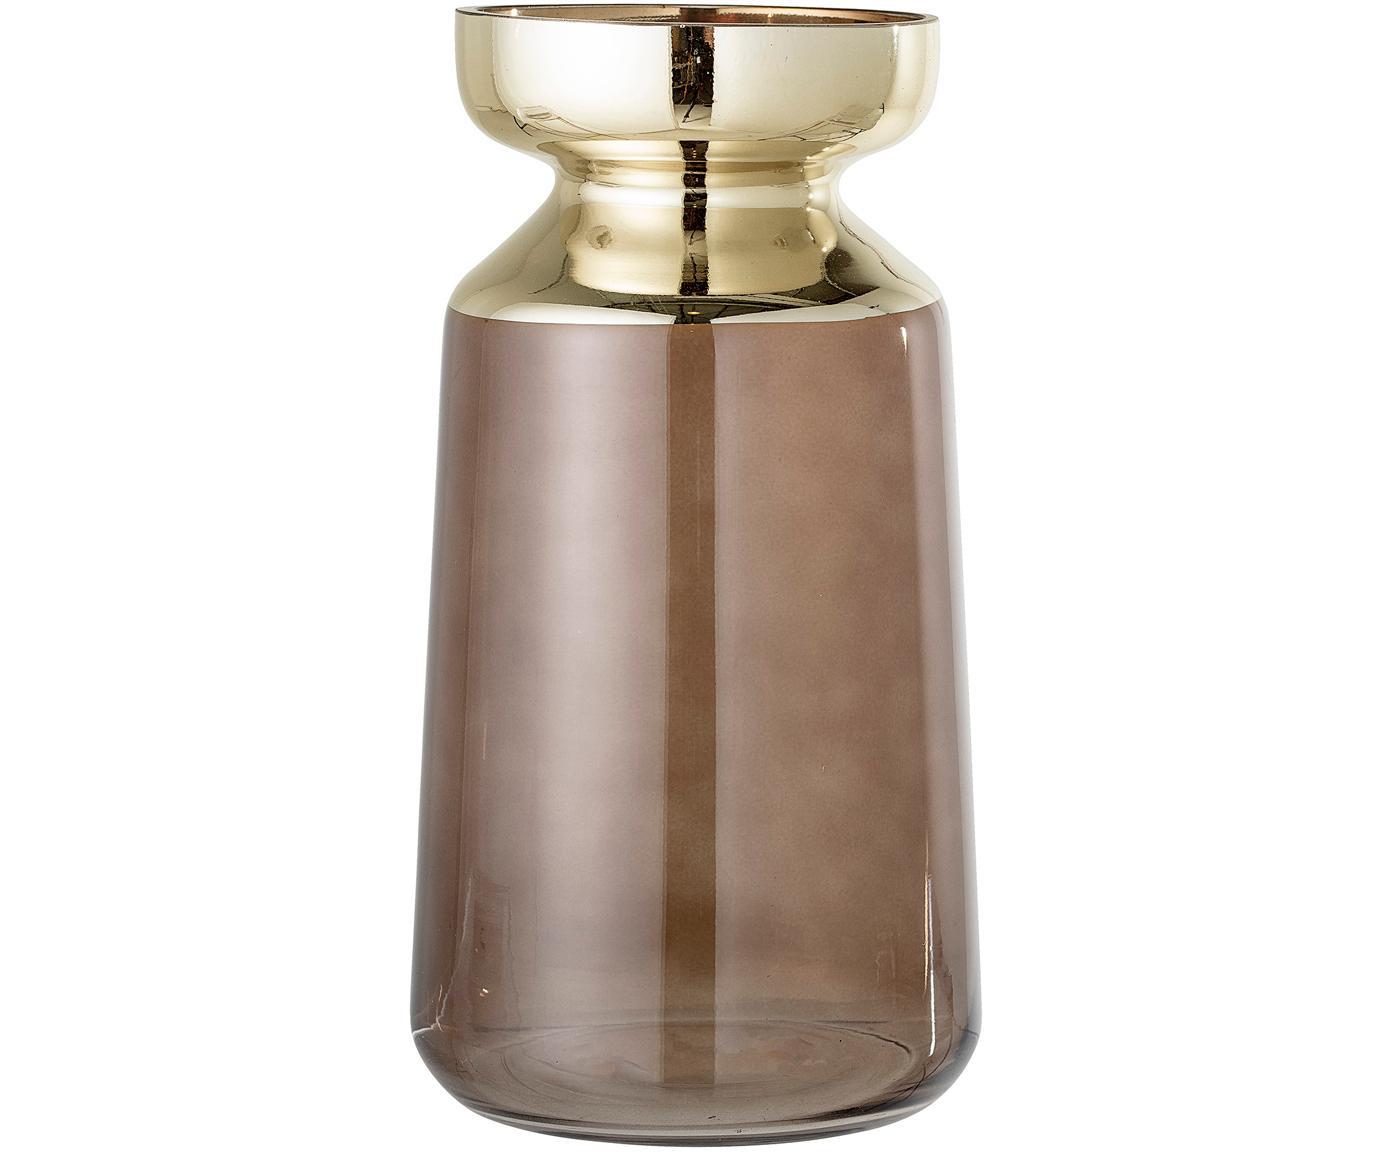 Vaso Shine, Vetro, Marrone dorato, Ø 16 x Alt. 30 cm